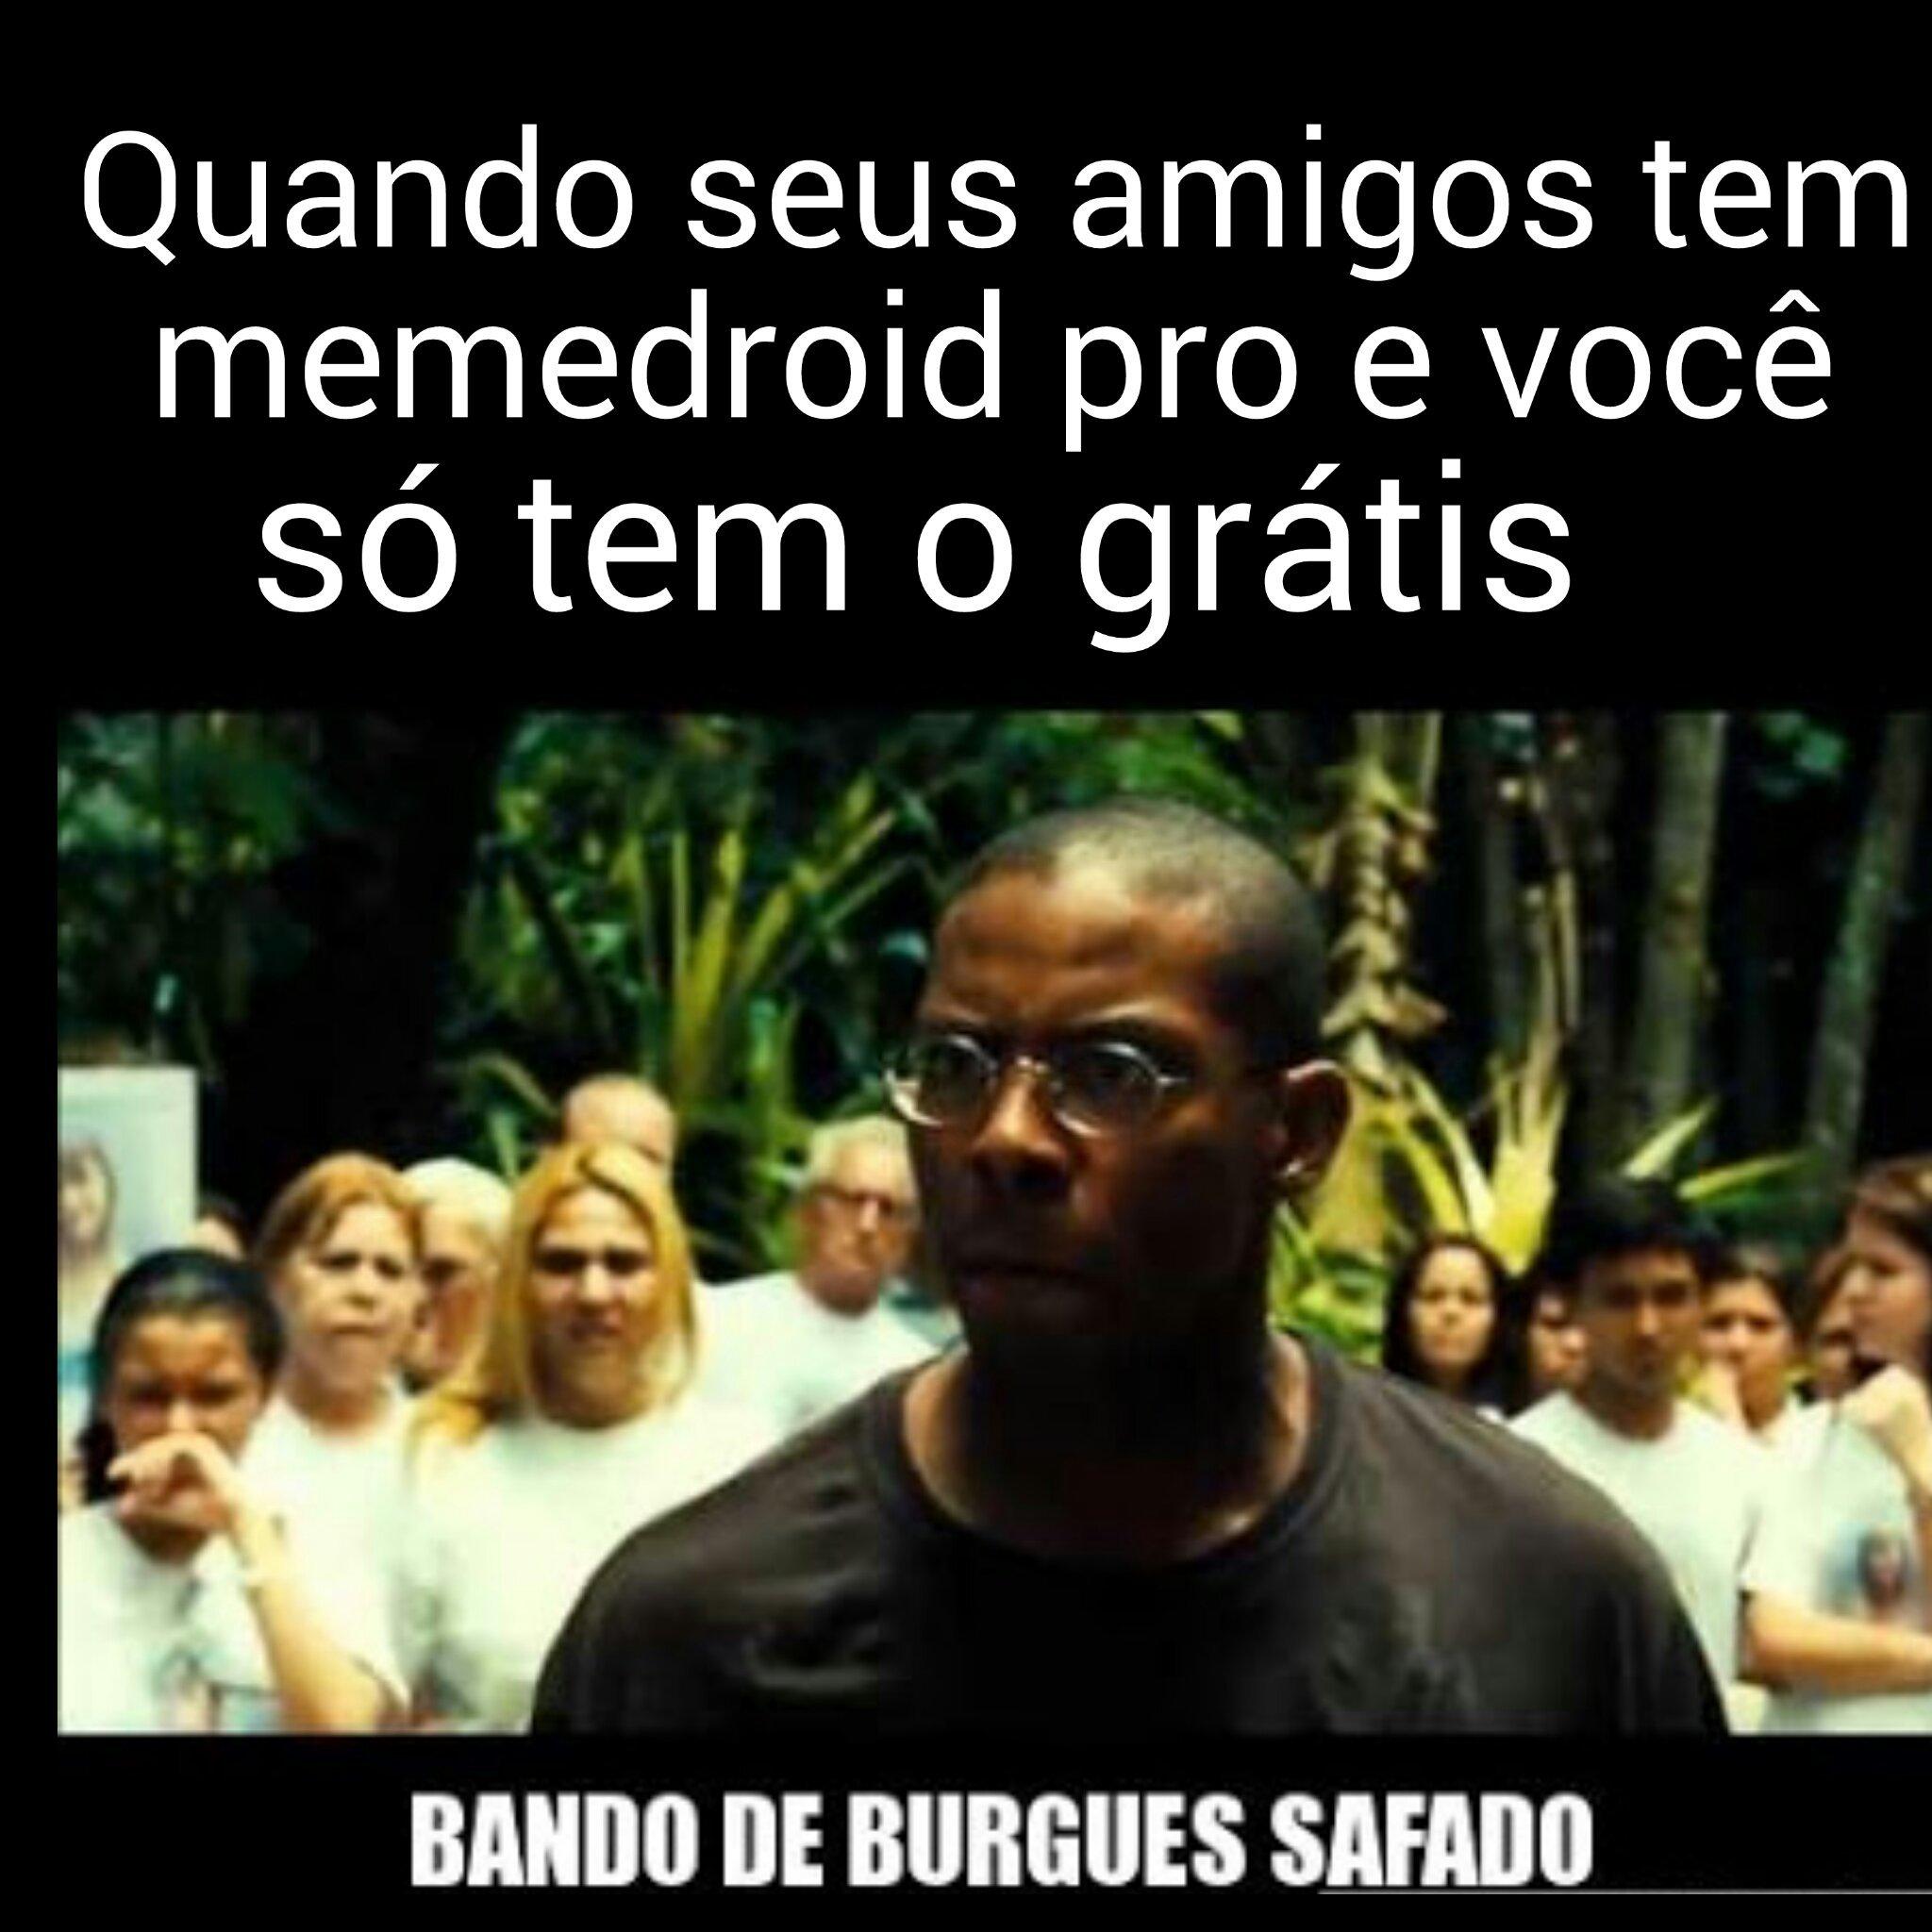 BANDO DE BURGUES SAFADO - meme